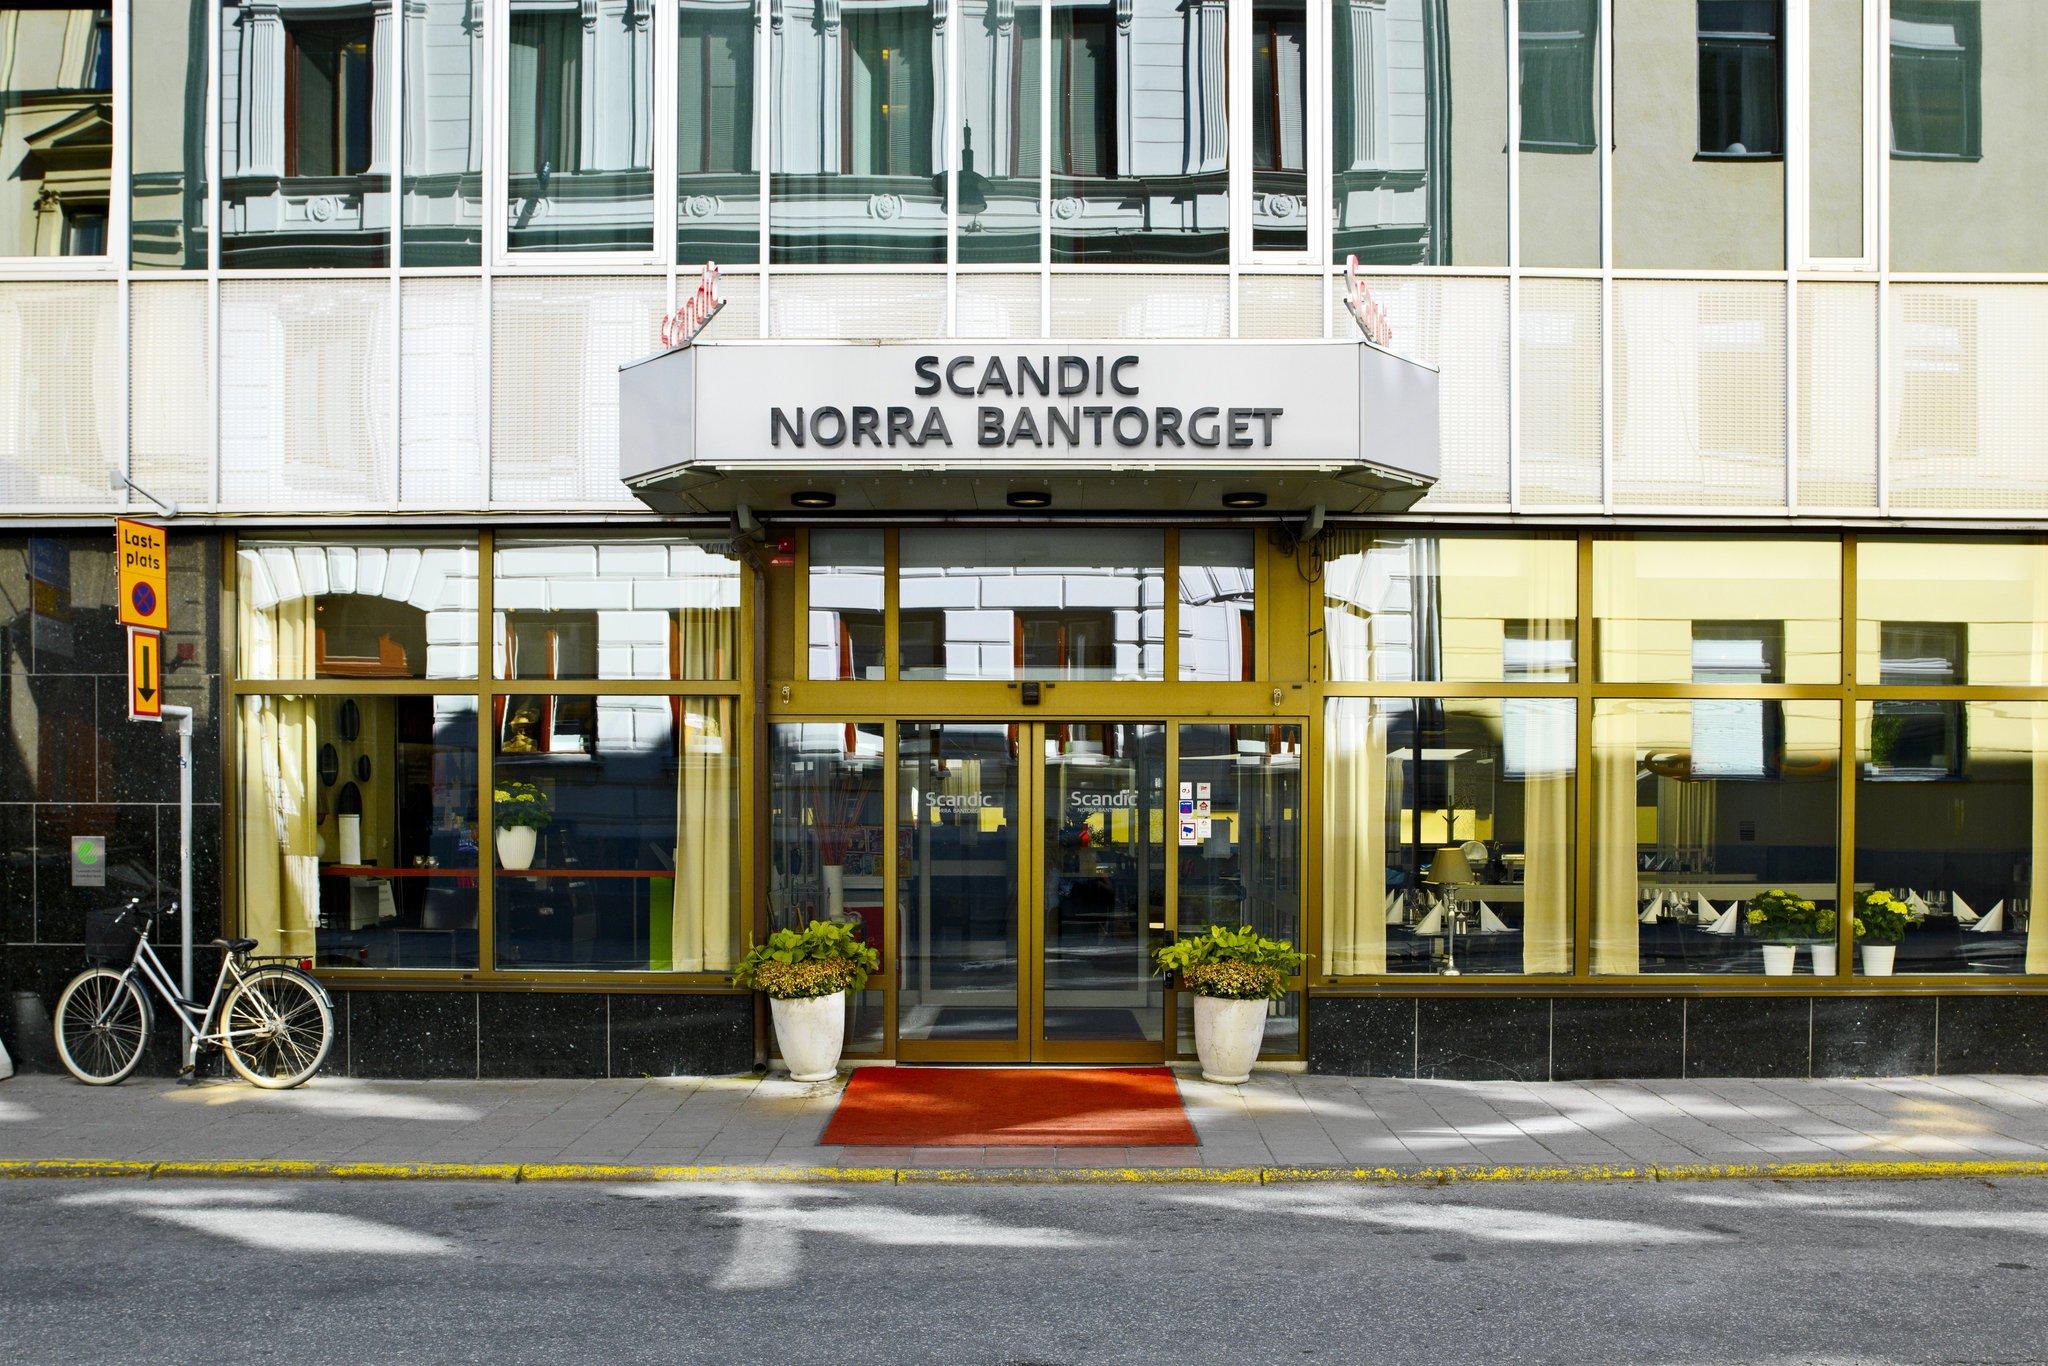 Scandic Norra Bantorget